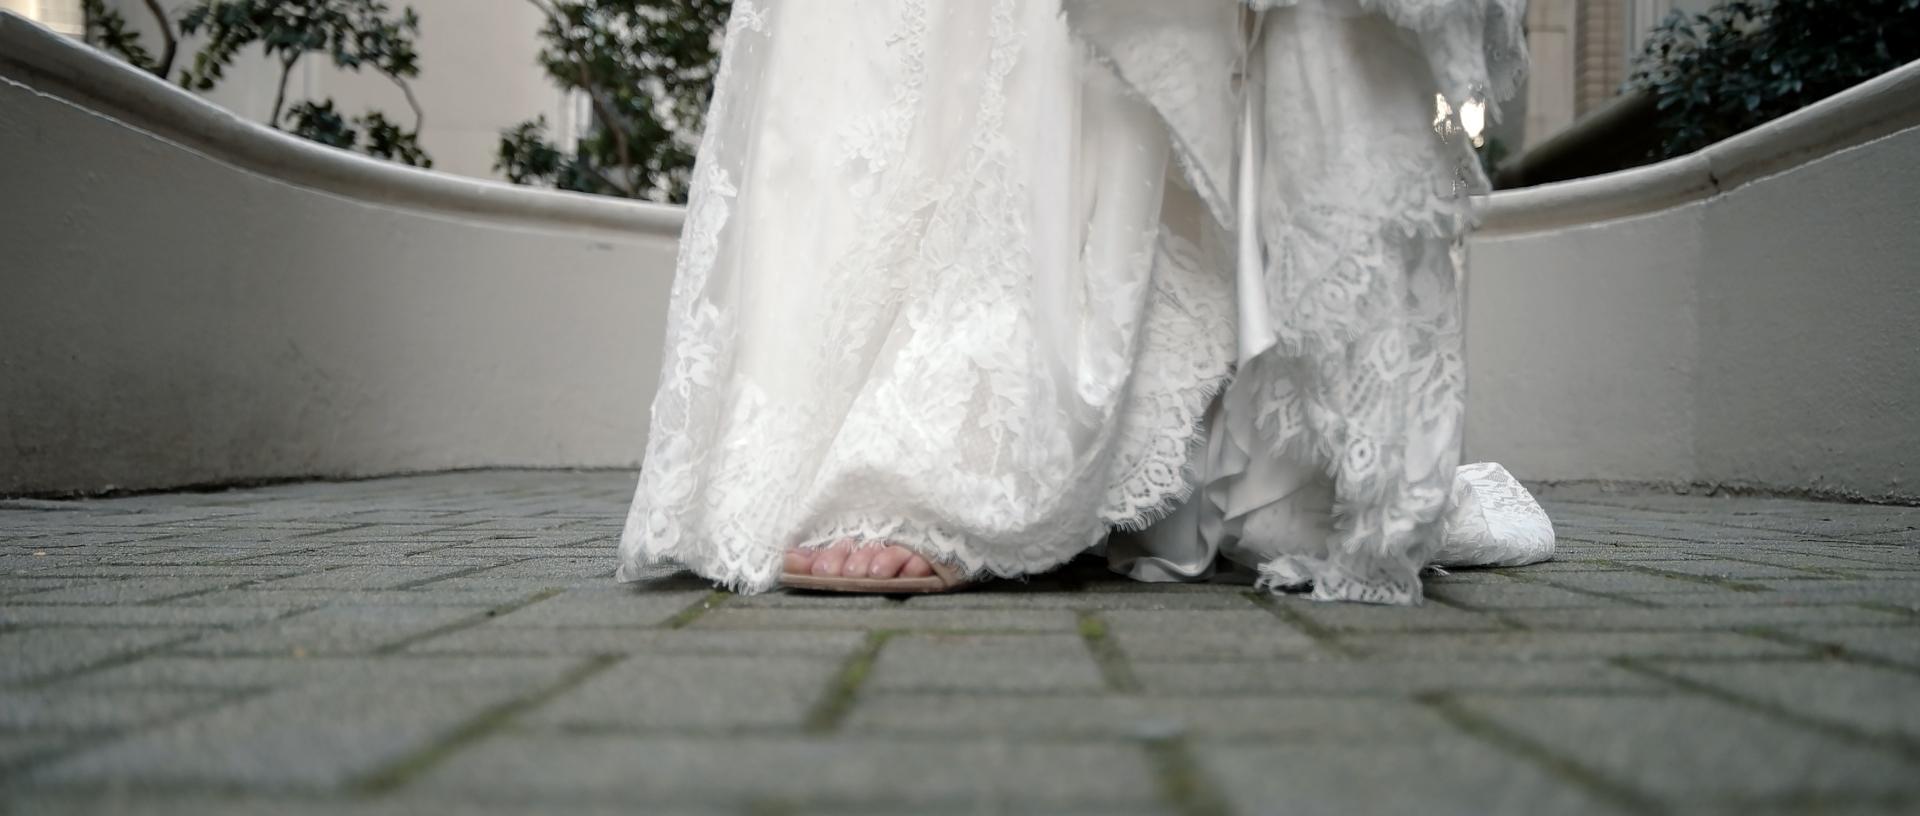 Atlanta Wedding Videographer0013.jpg